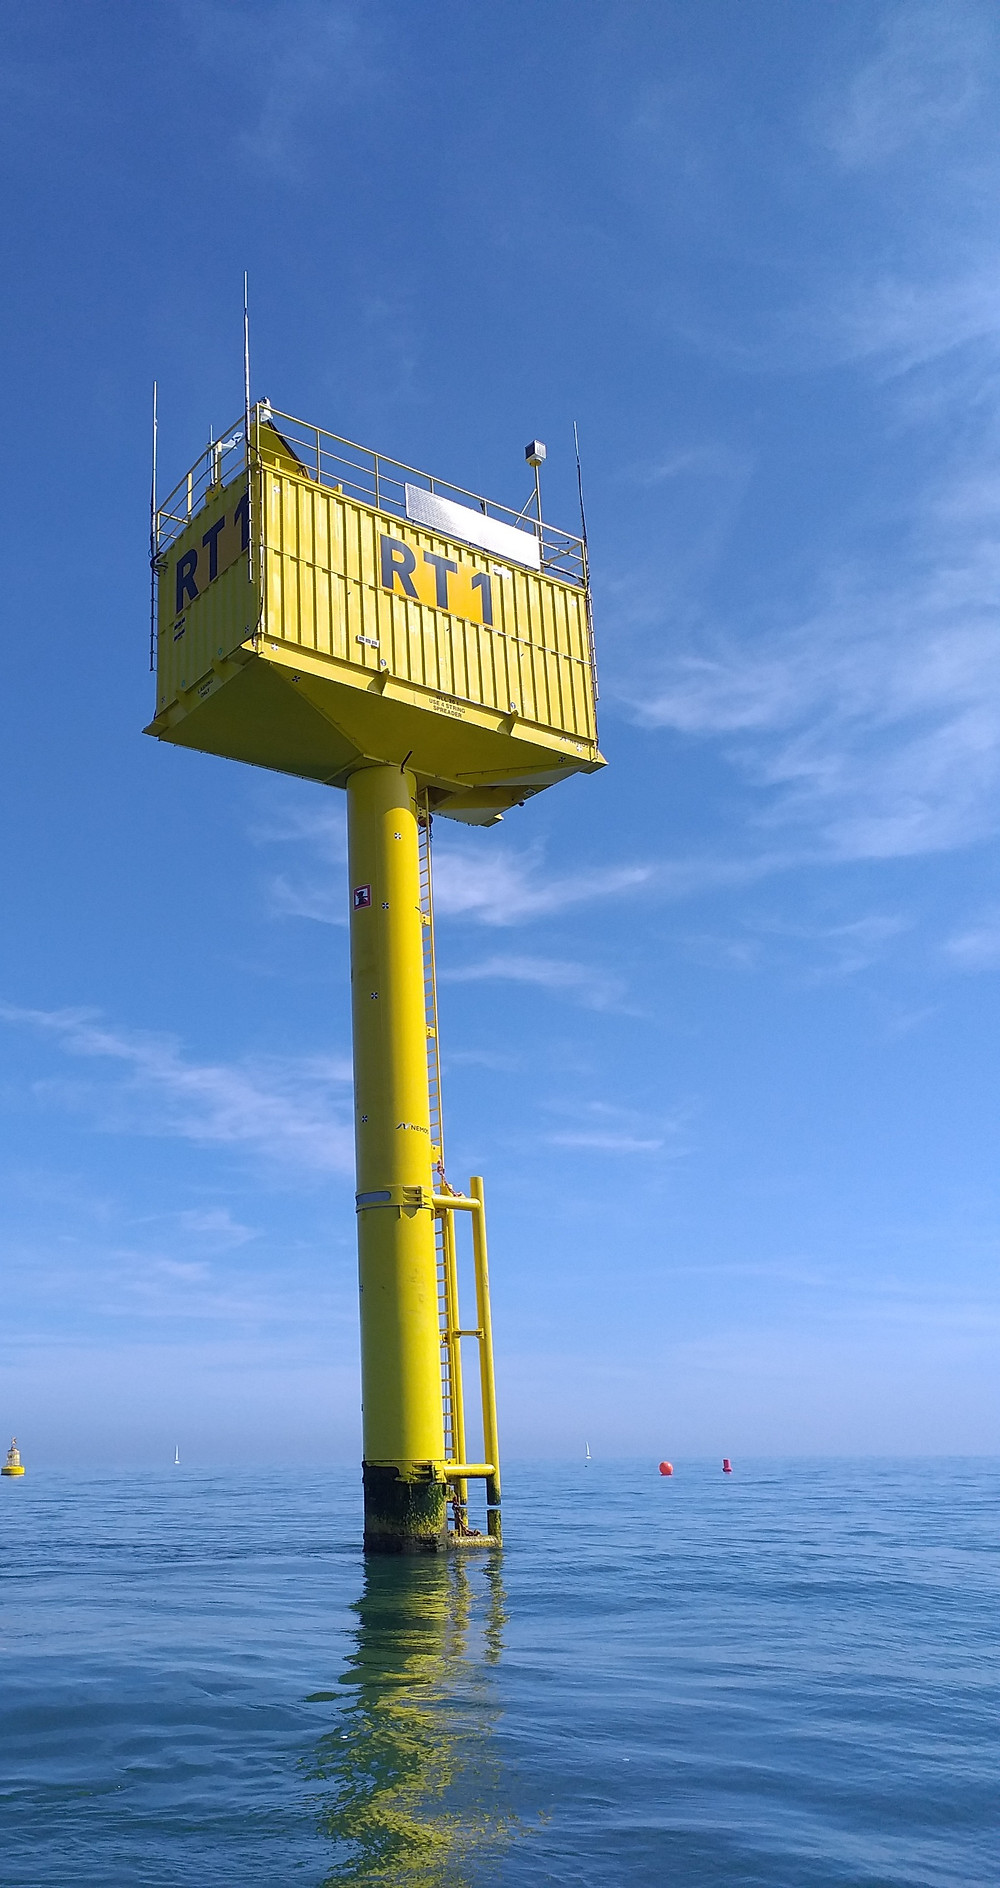 Maritime innovation and development platform Blue Accelerator.